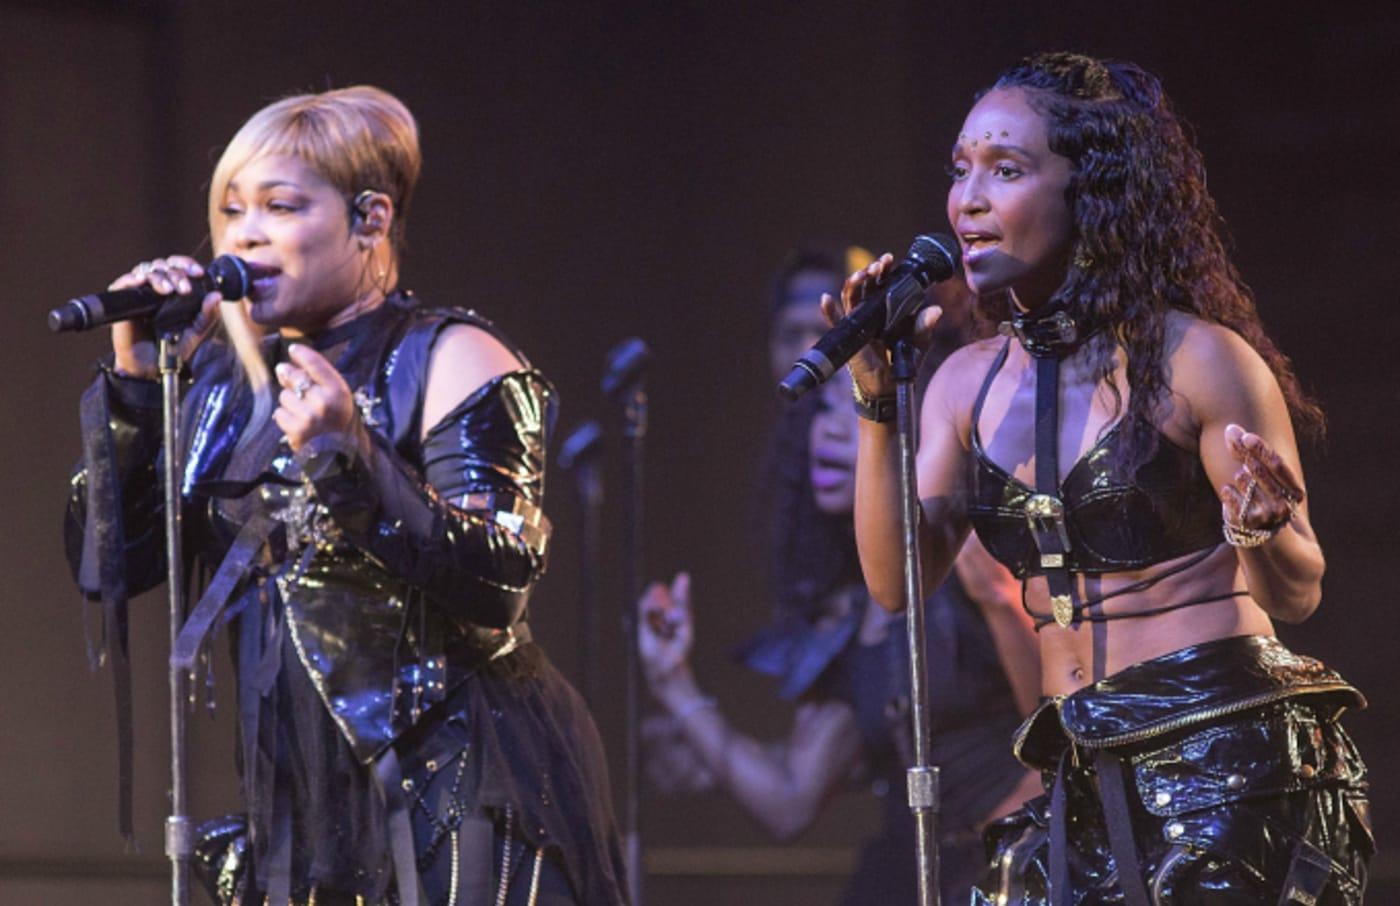 Singers Tionne 'T Boz' Watkins (L) and Rozonda 'Chilli' Thomas of TLC